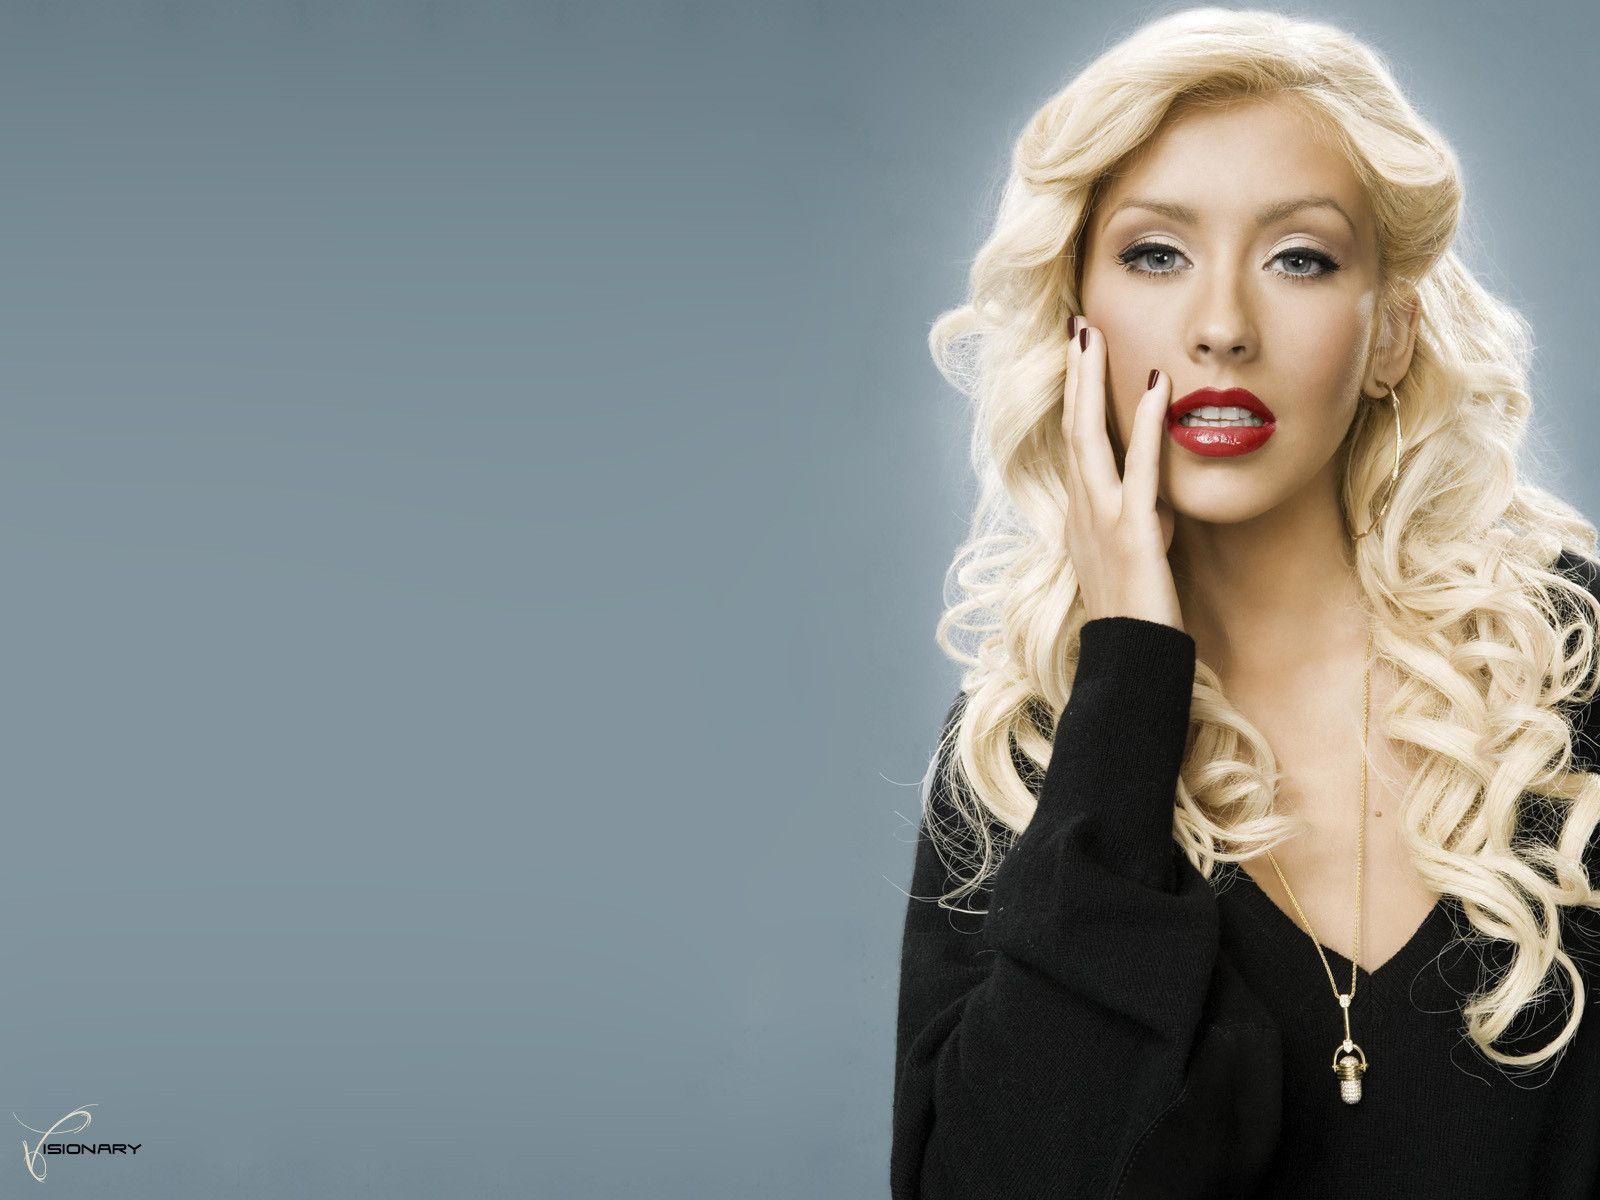 Christina Aguilera Wallpaper for Desktop